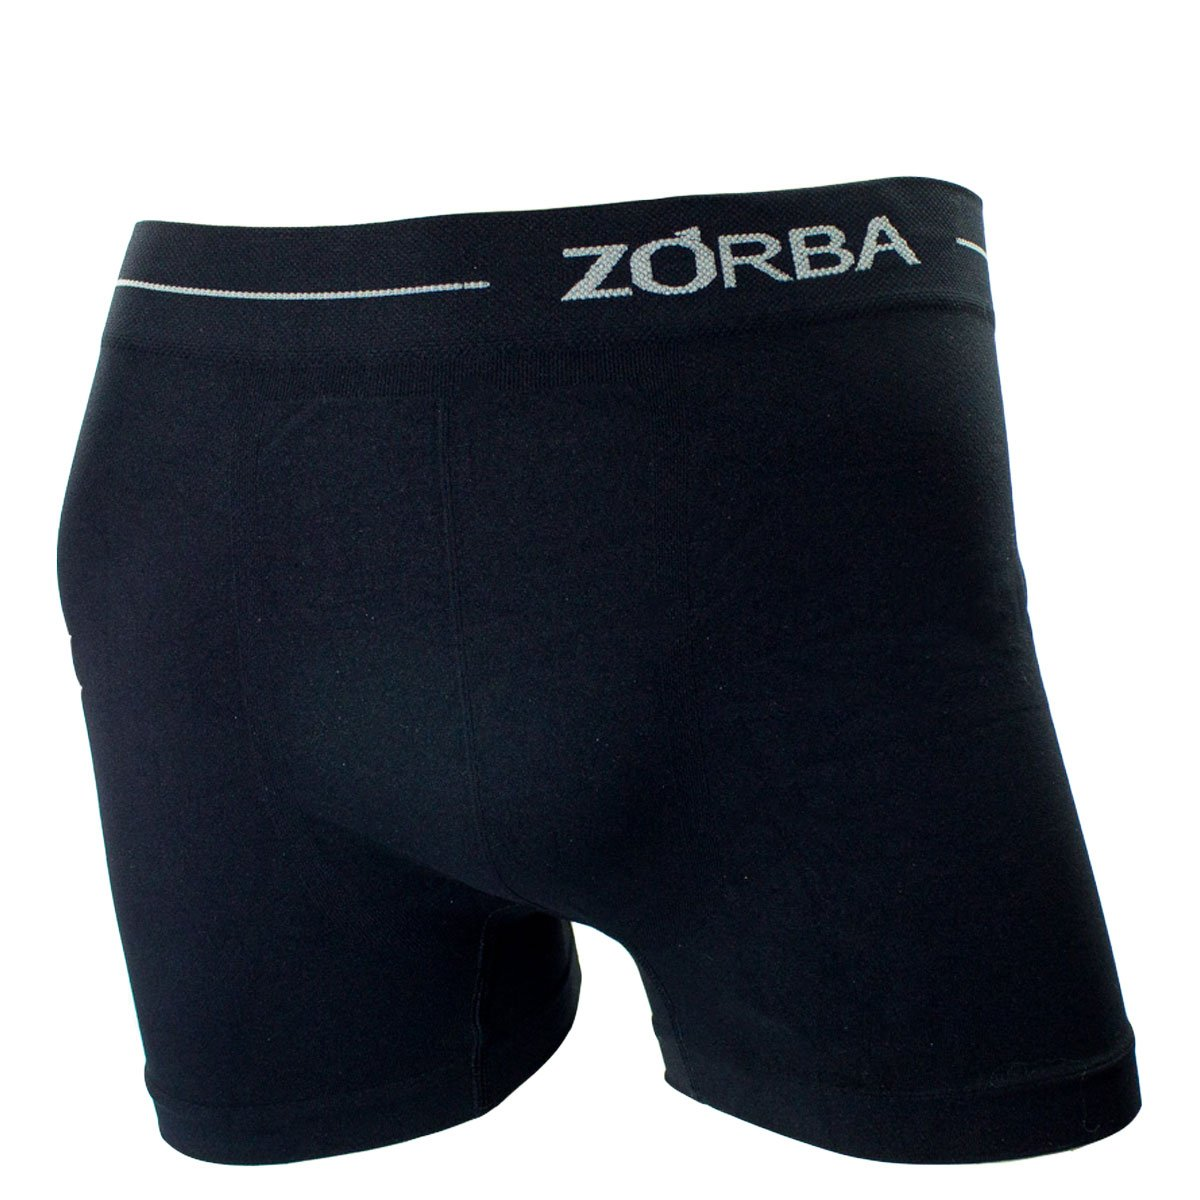 e9a327eed Bizz Store - Cueca Masculina Zorba Boxer